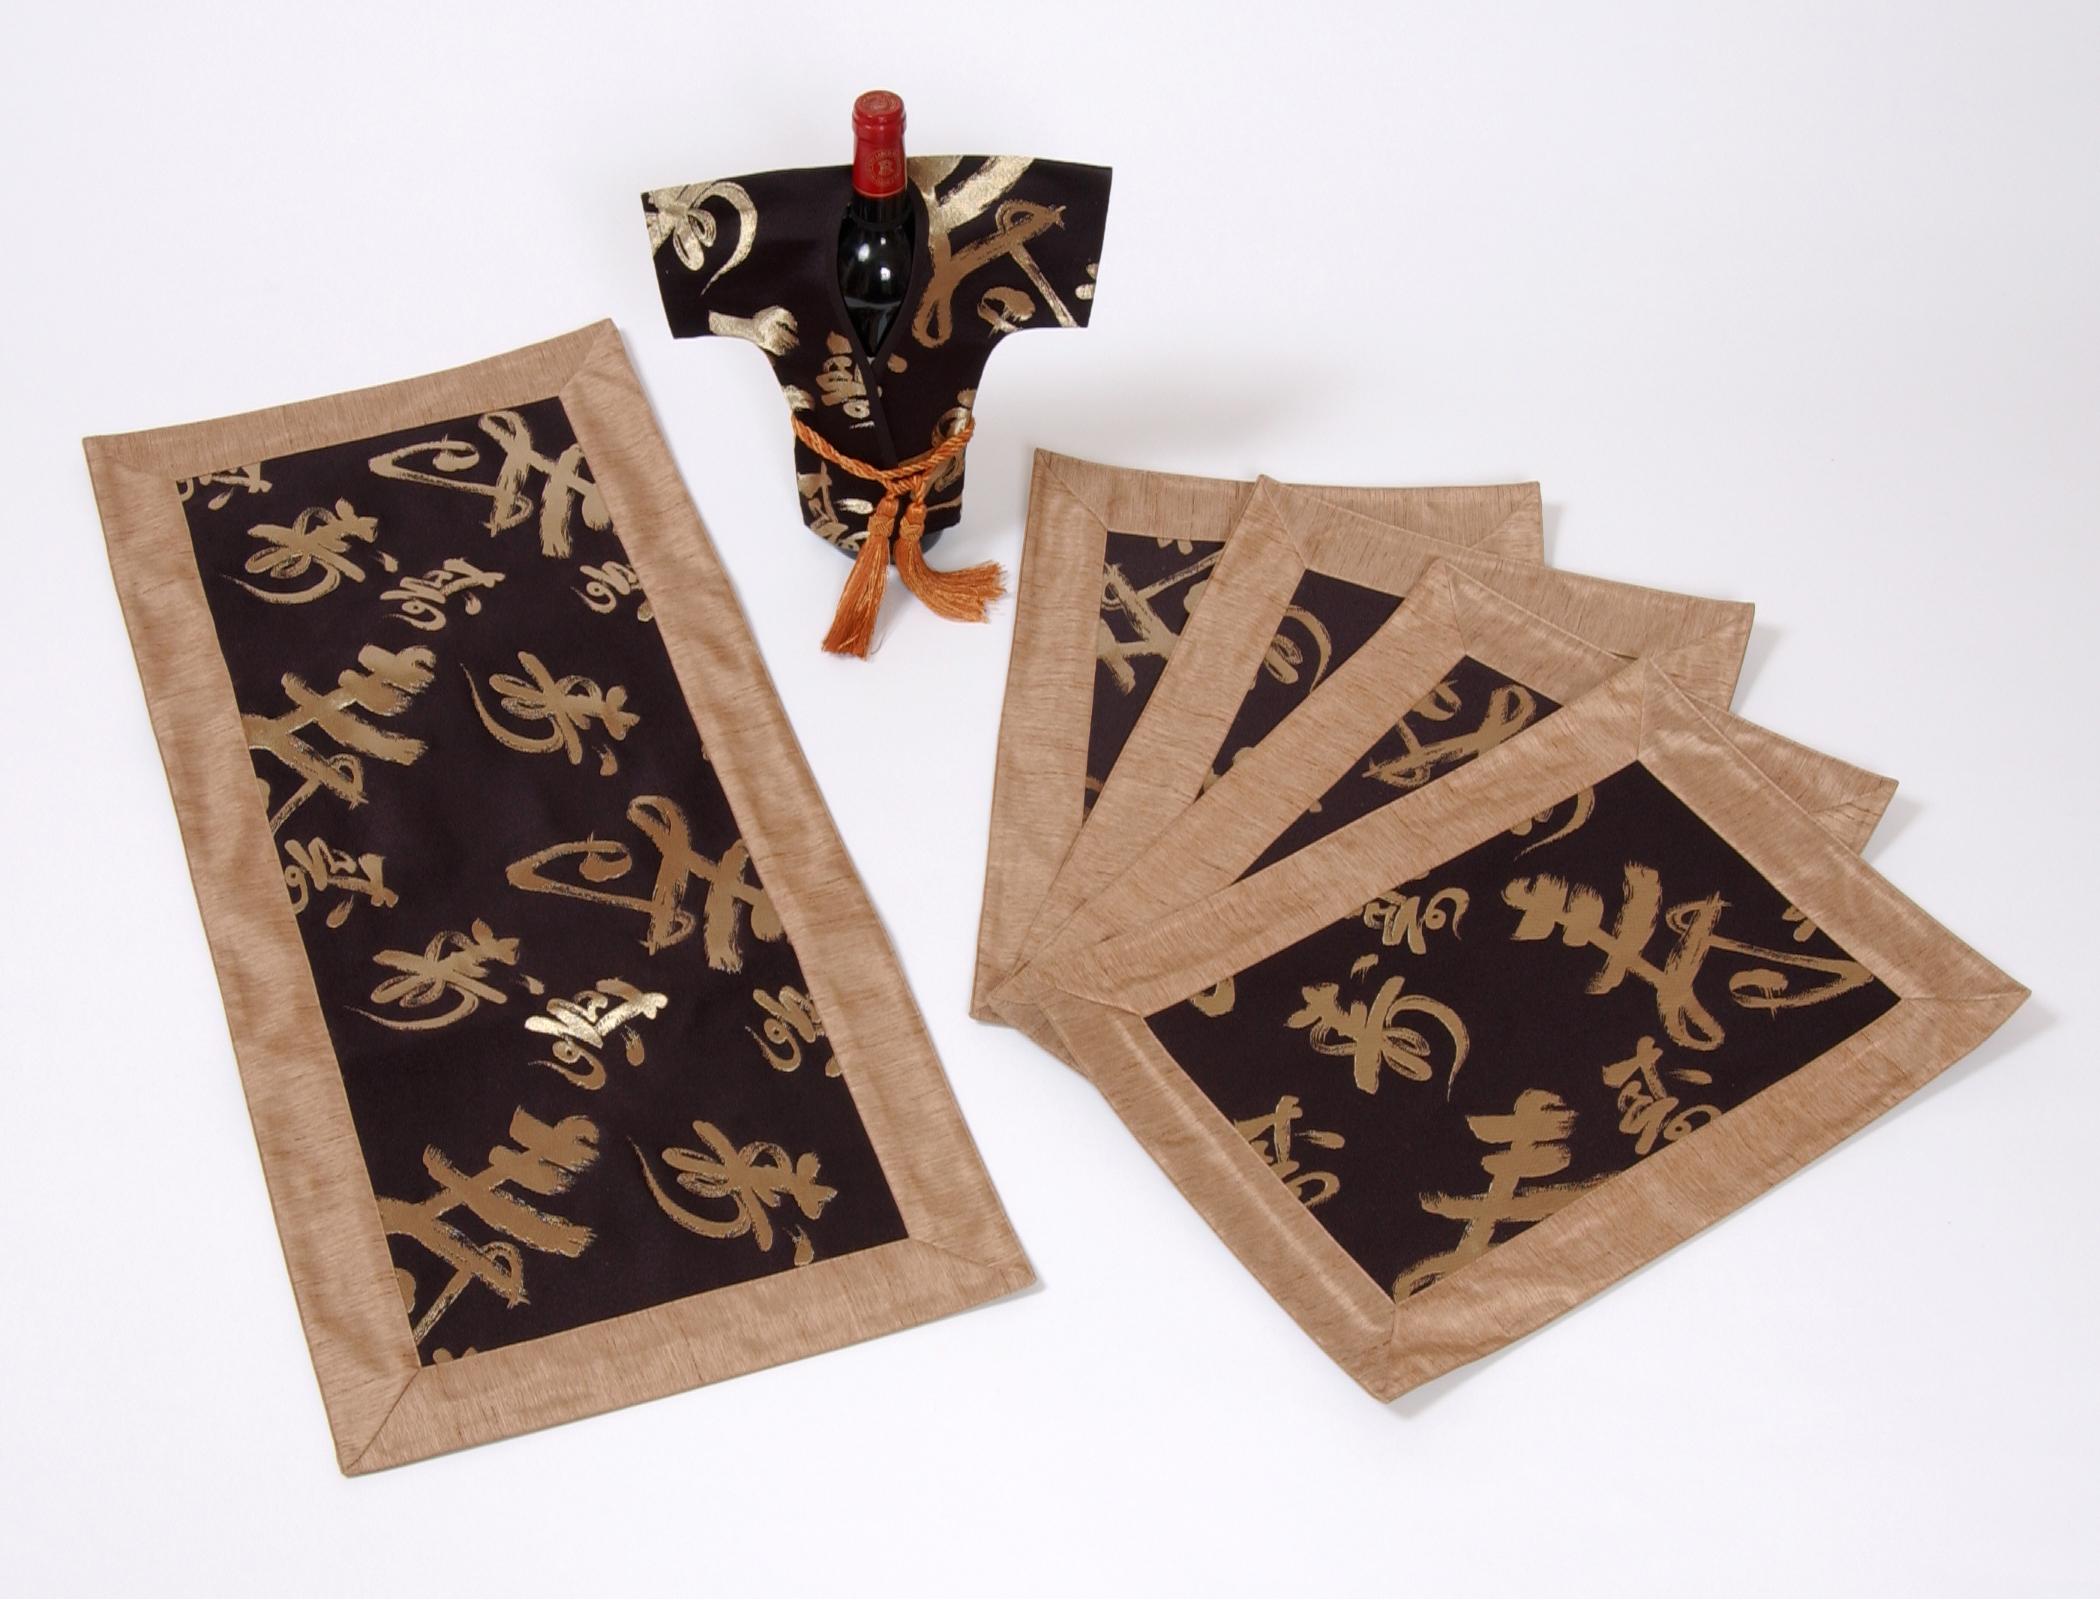 Unique Japan Table Linen Gift Set. KOTOBUKI meaning celebration & Unique Japan Table Linen Gift Set « Unique Japan (uniquejapan.com)